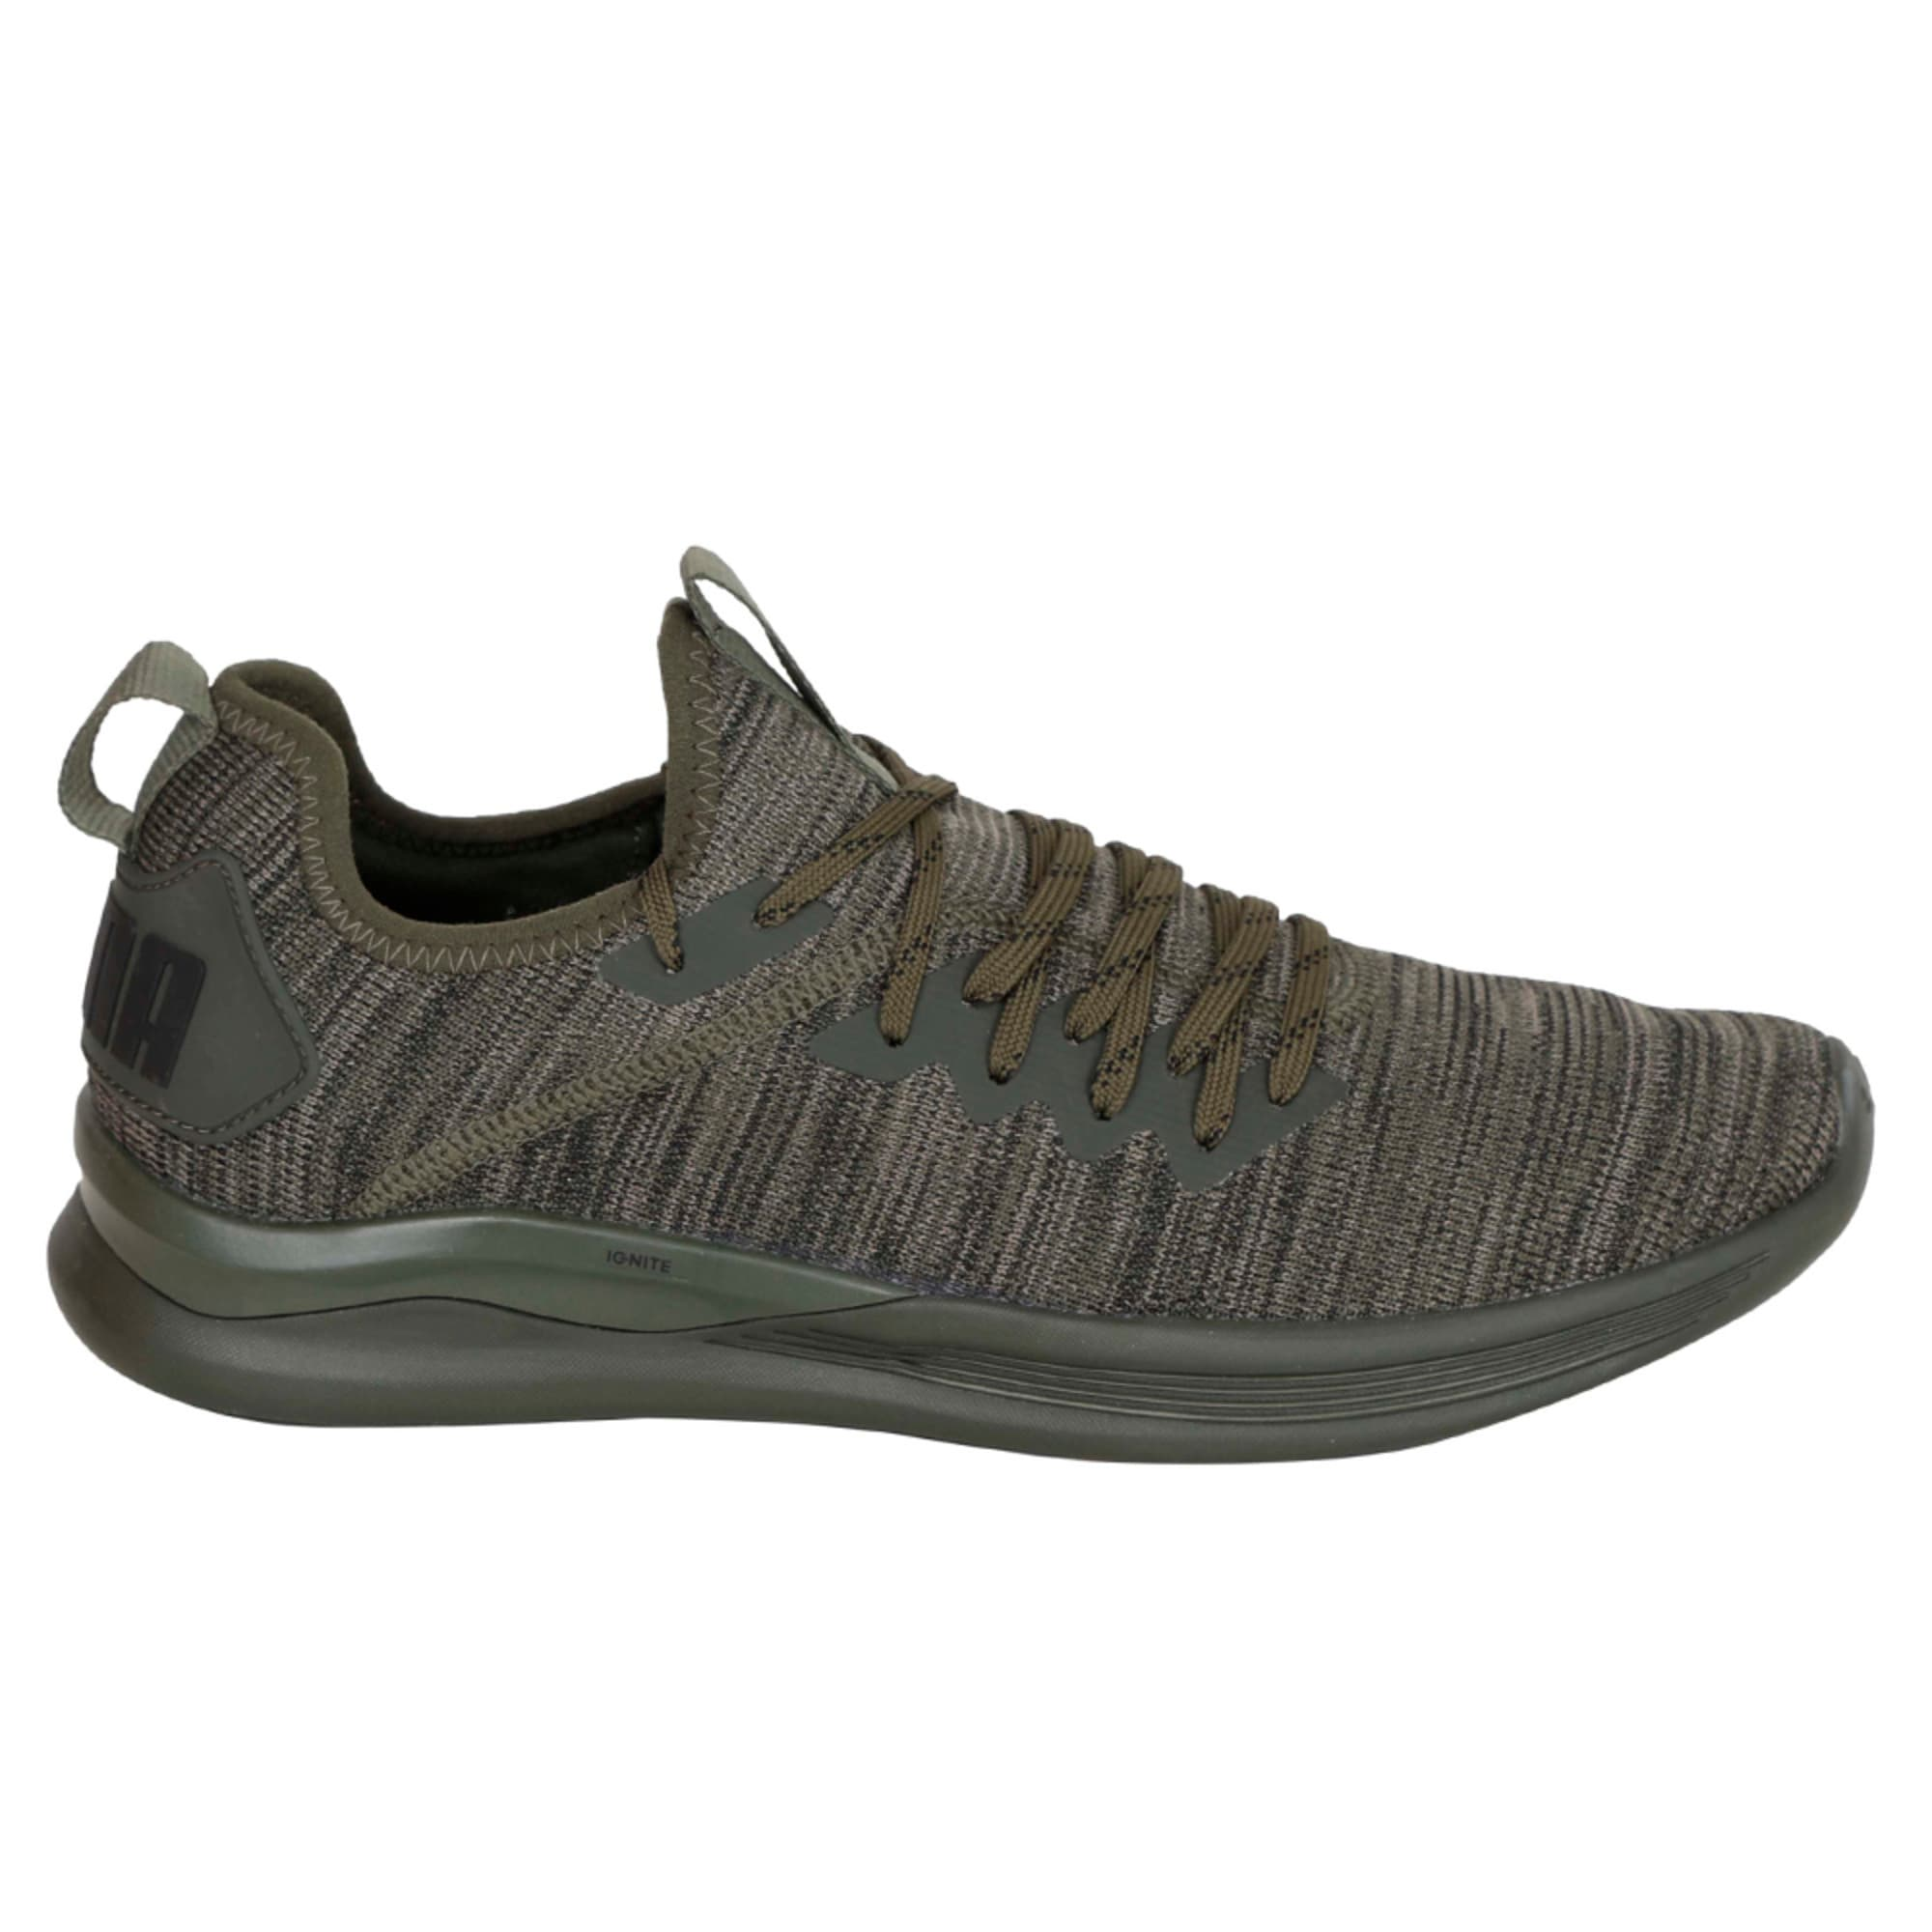 Thumbnail 3 of IGNITE Flash evoKNIT Men's Training Shoes, Forest Night-Gray-Black, medium-IND